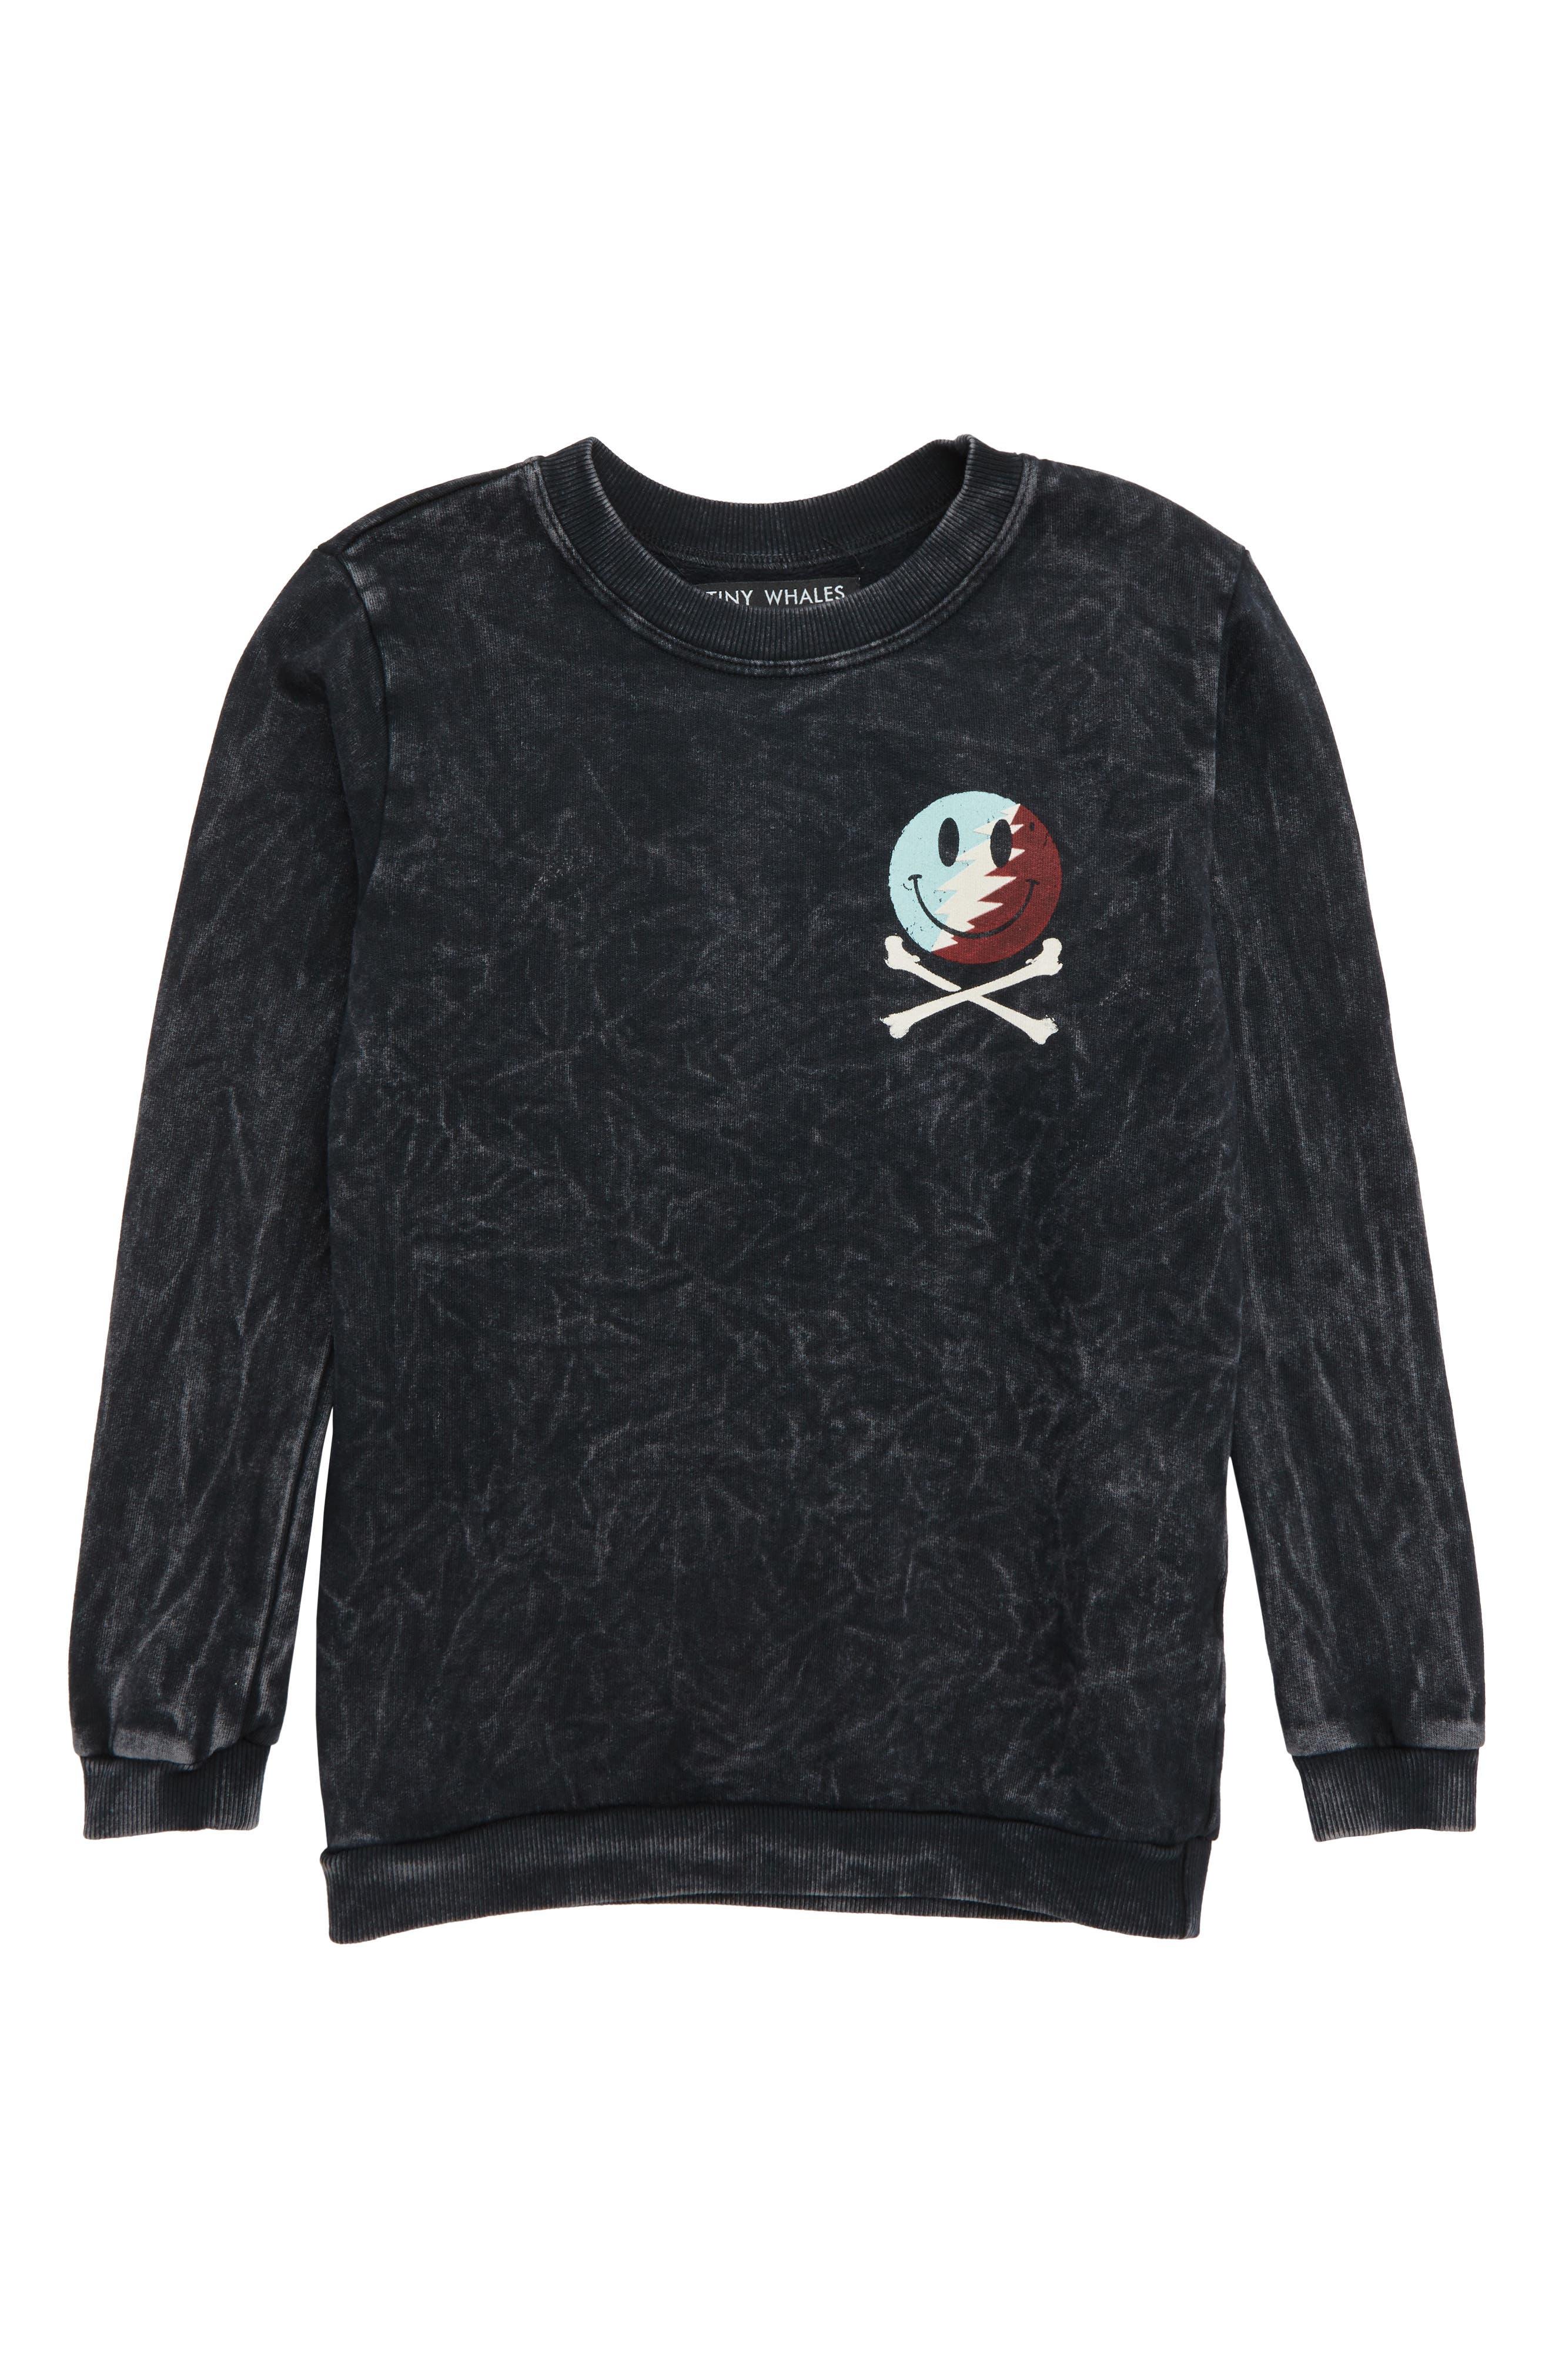 Rad to the Bone Sweatshirt,                         Main,                         color, MINERAL BLACK